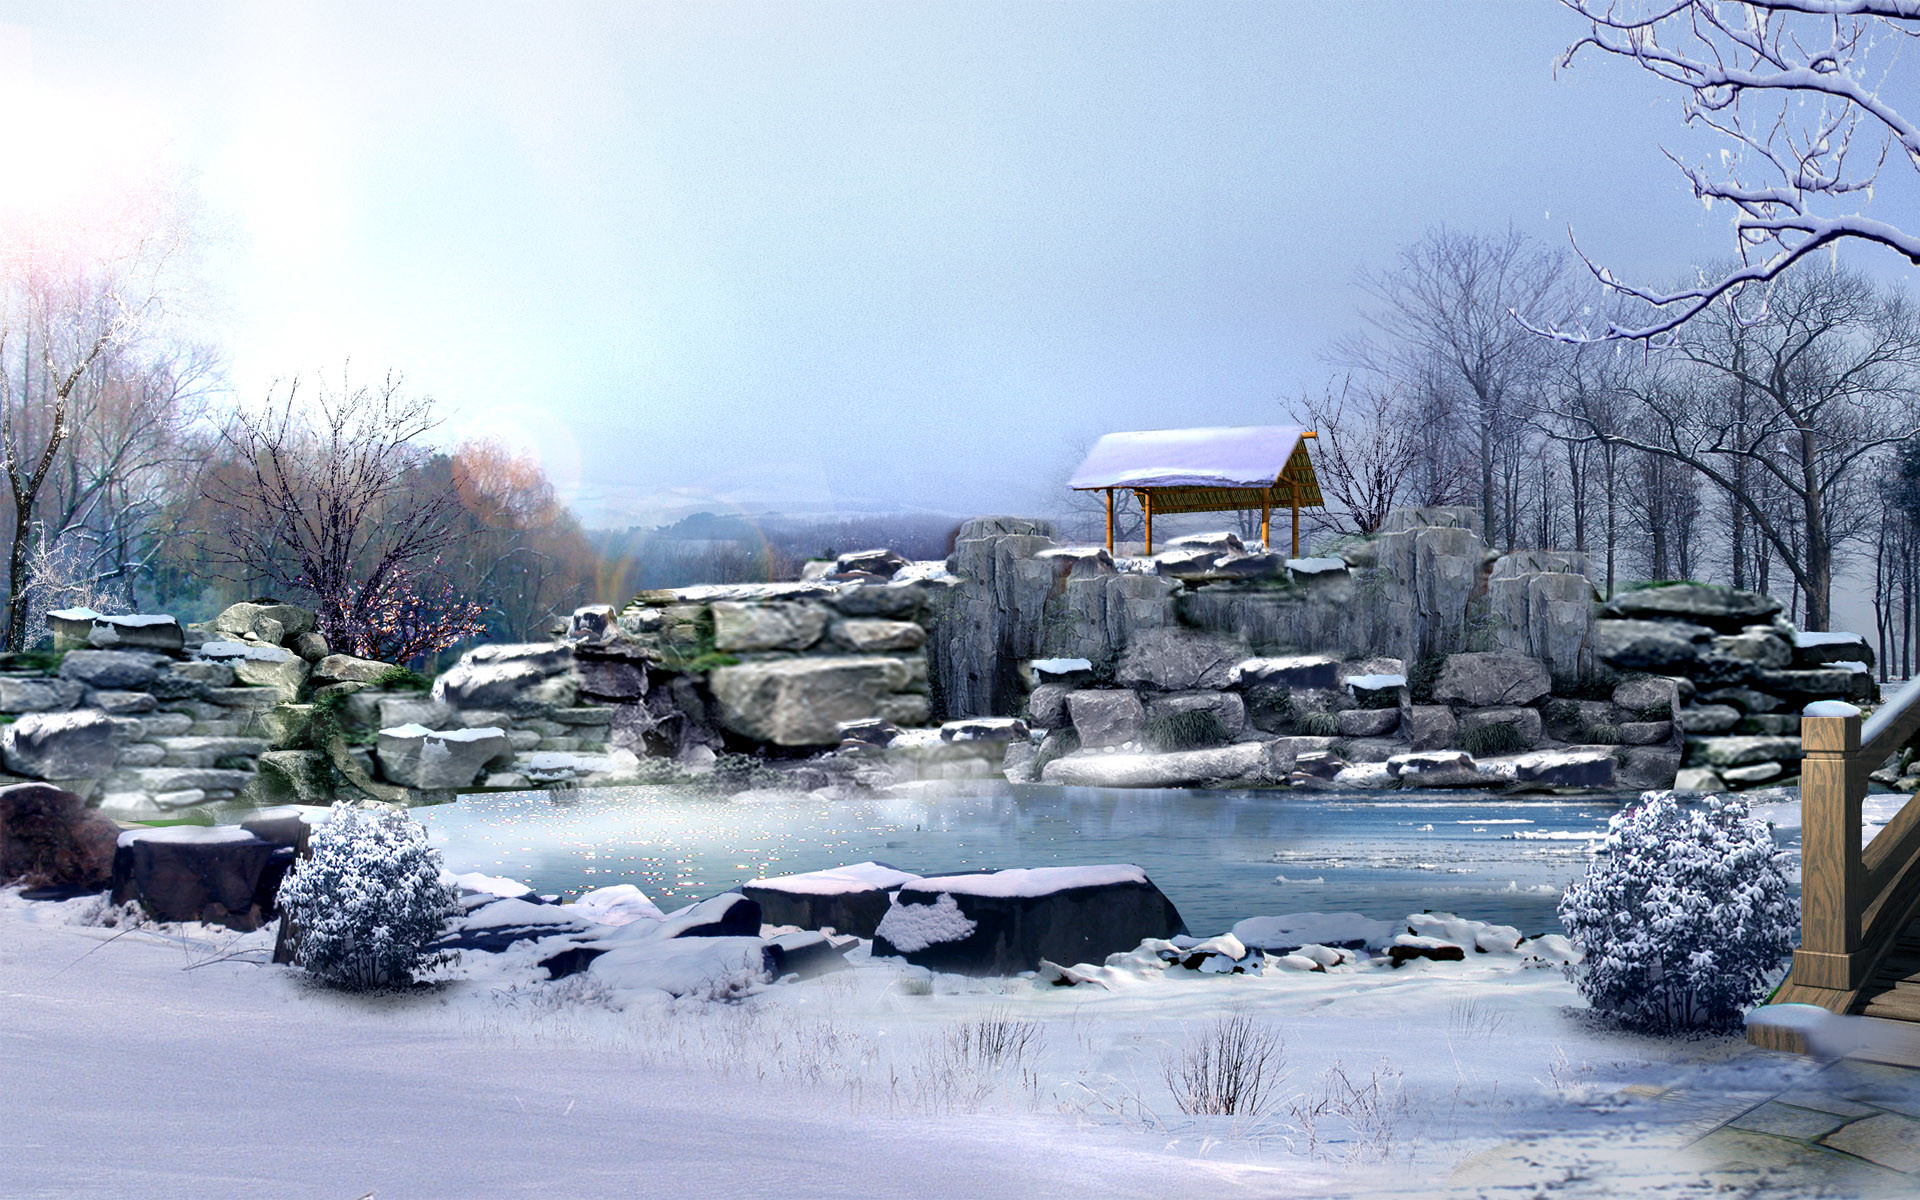 Japan China Digital Landscape 9 – Japan Photography Desktop Wallpapers .